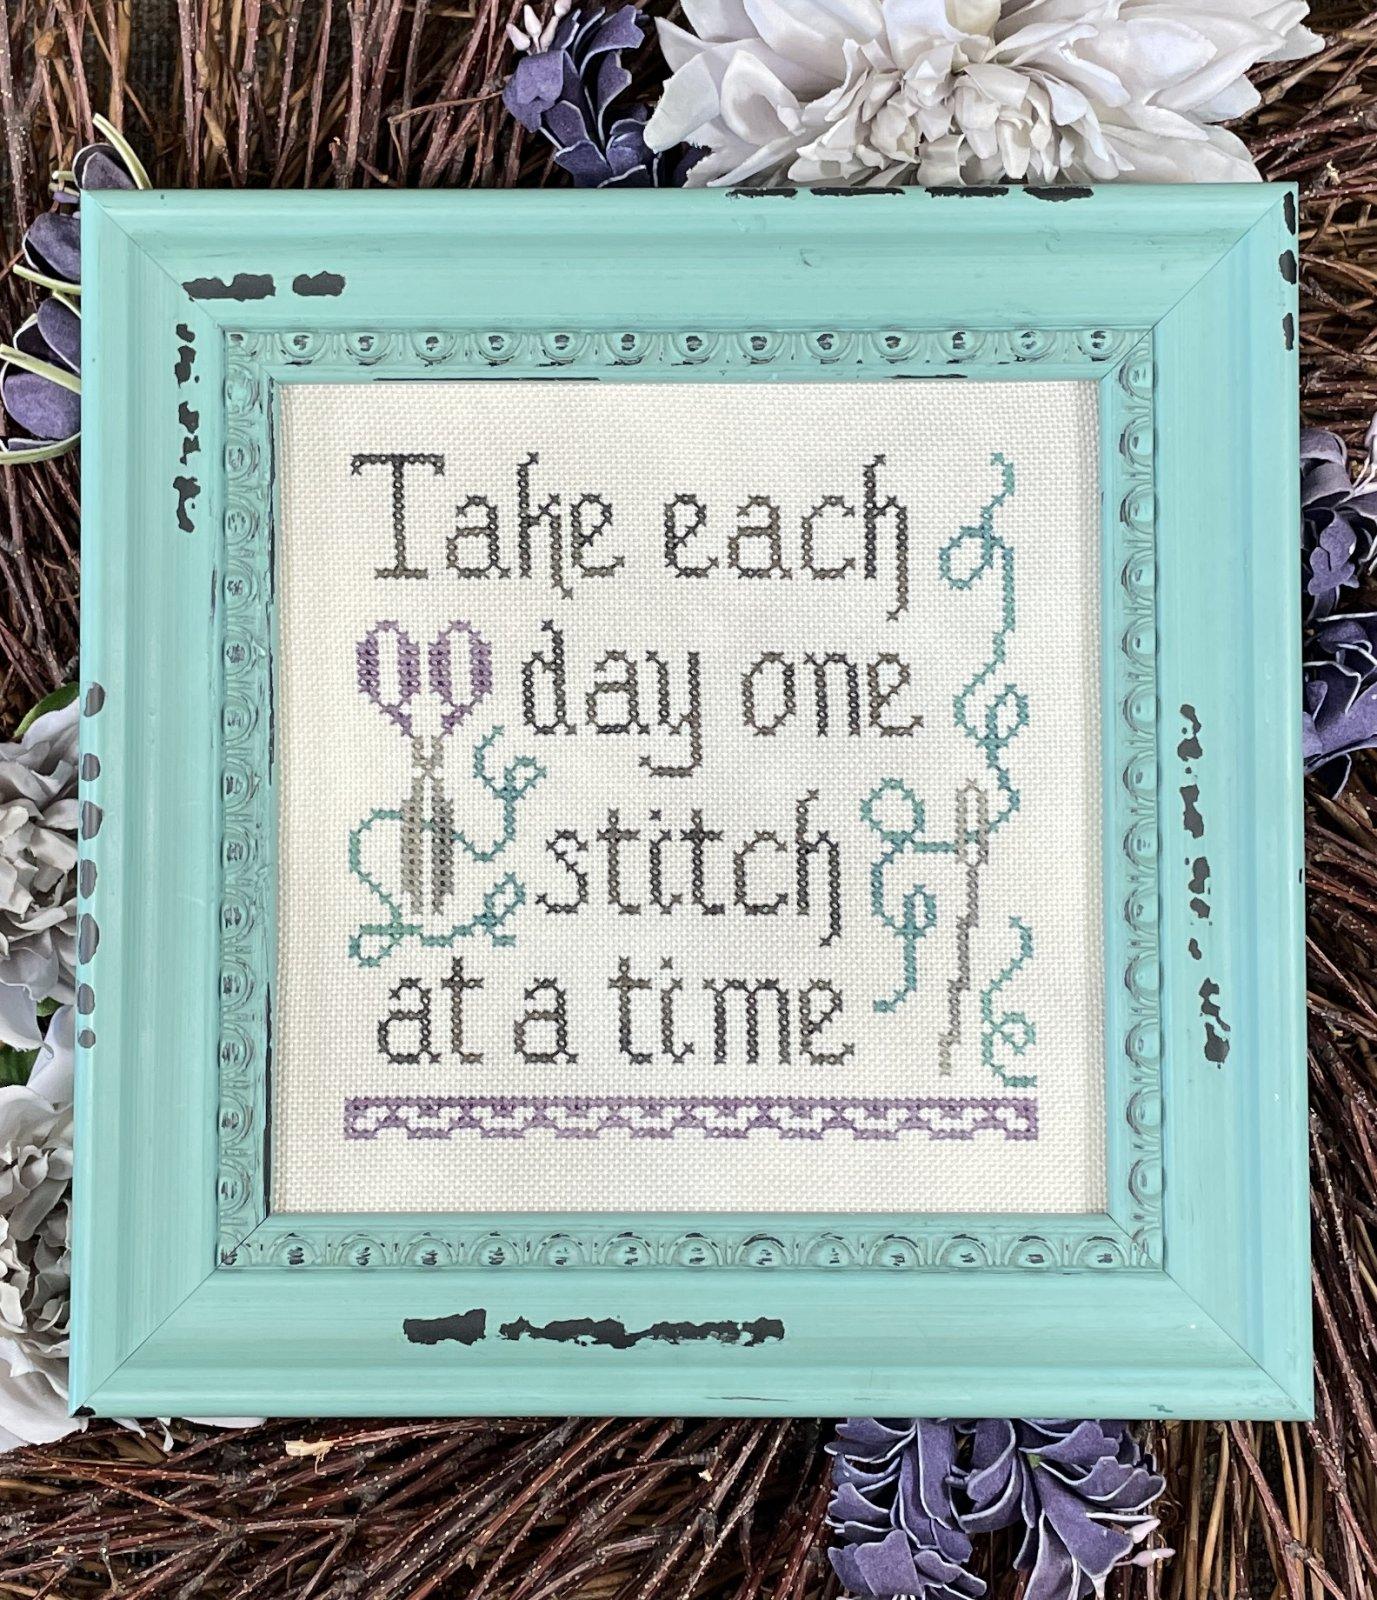 My Big Toe - One Stitch at a Time